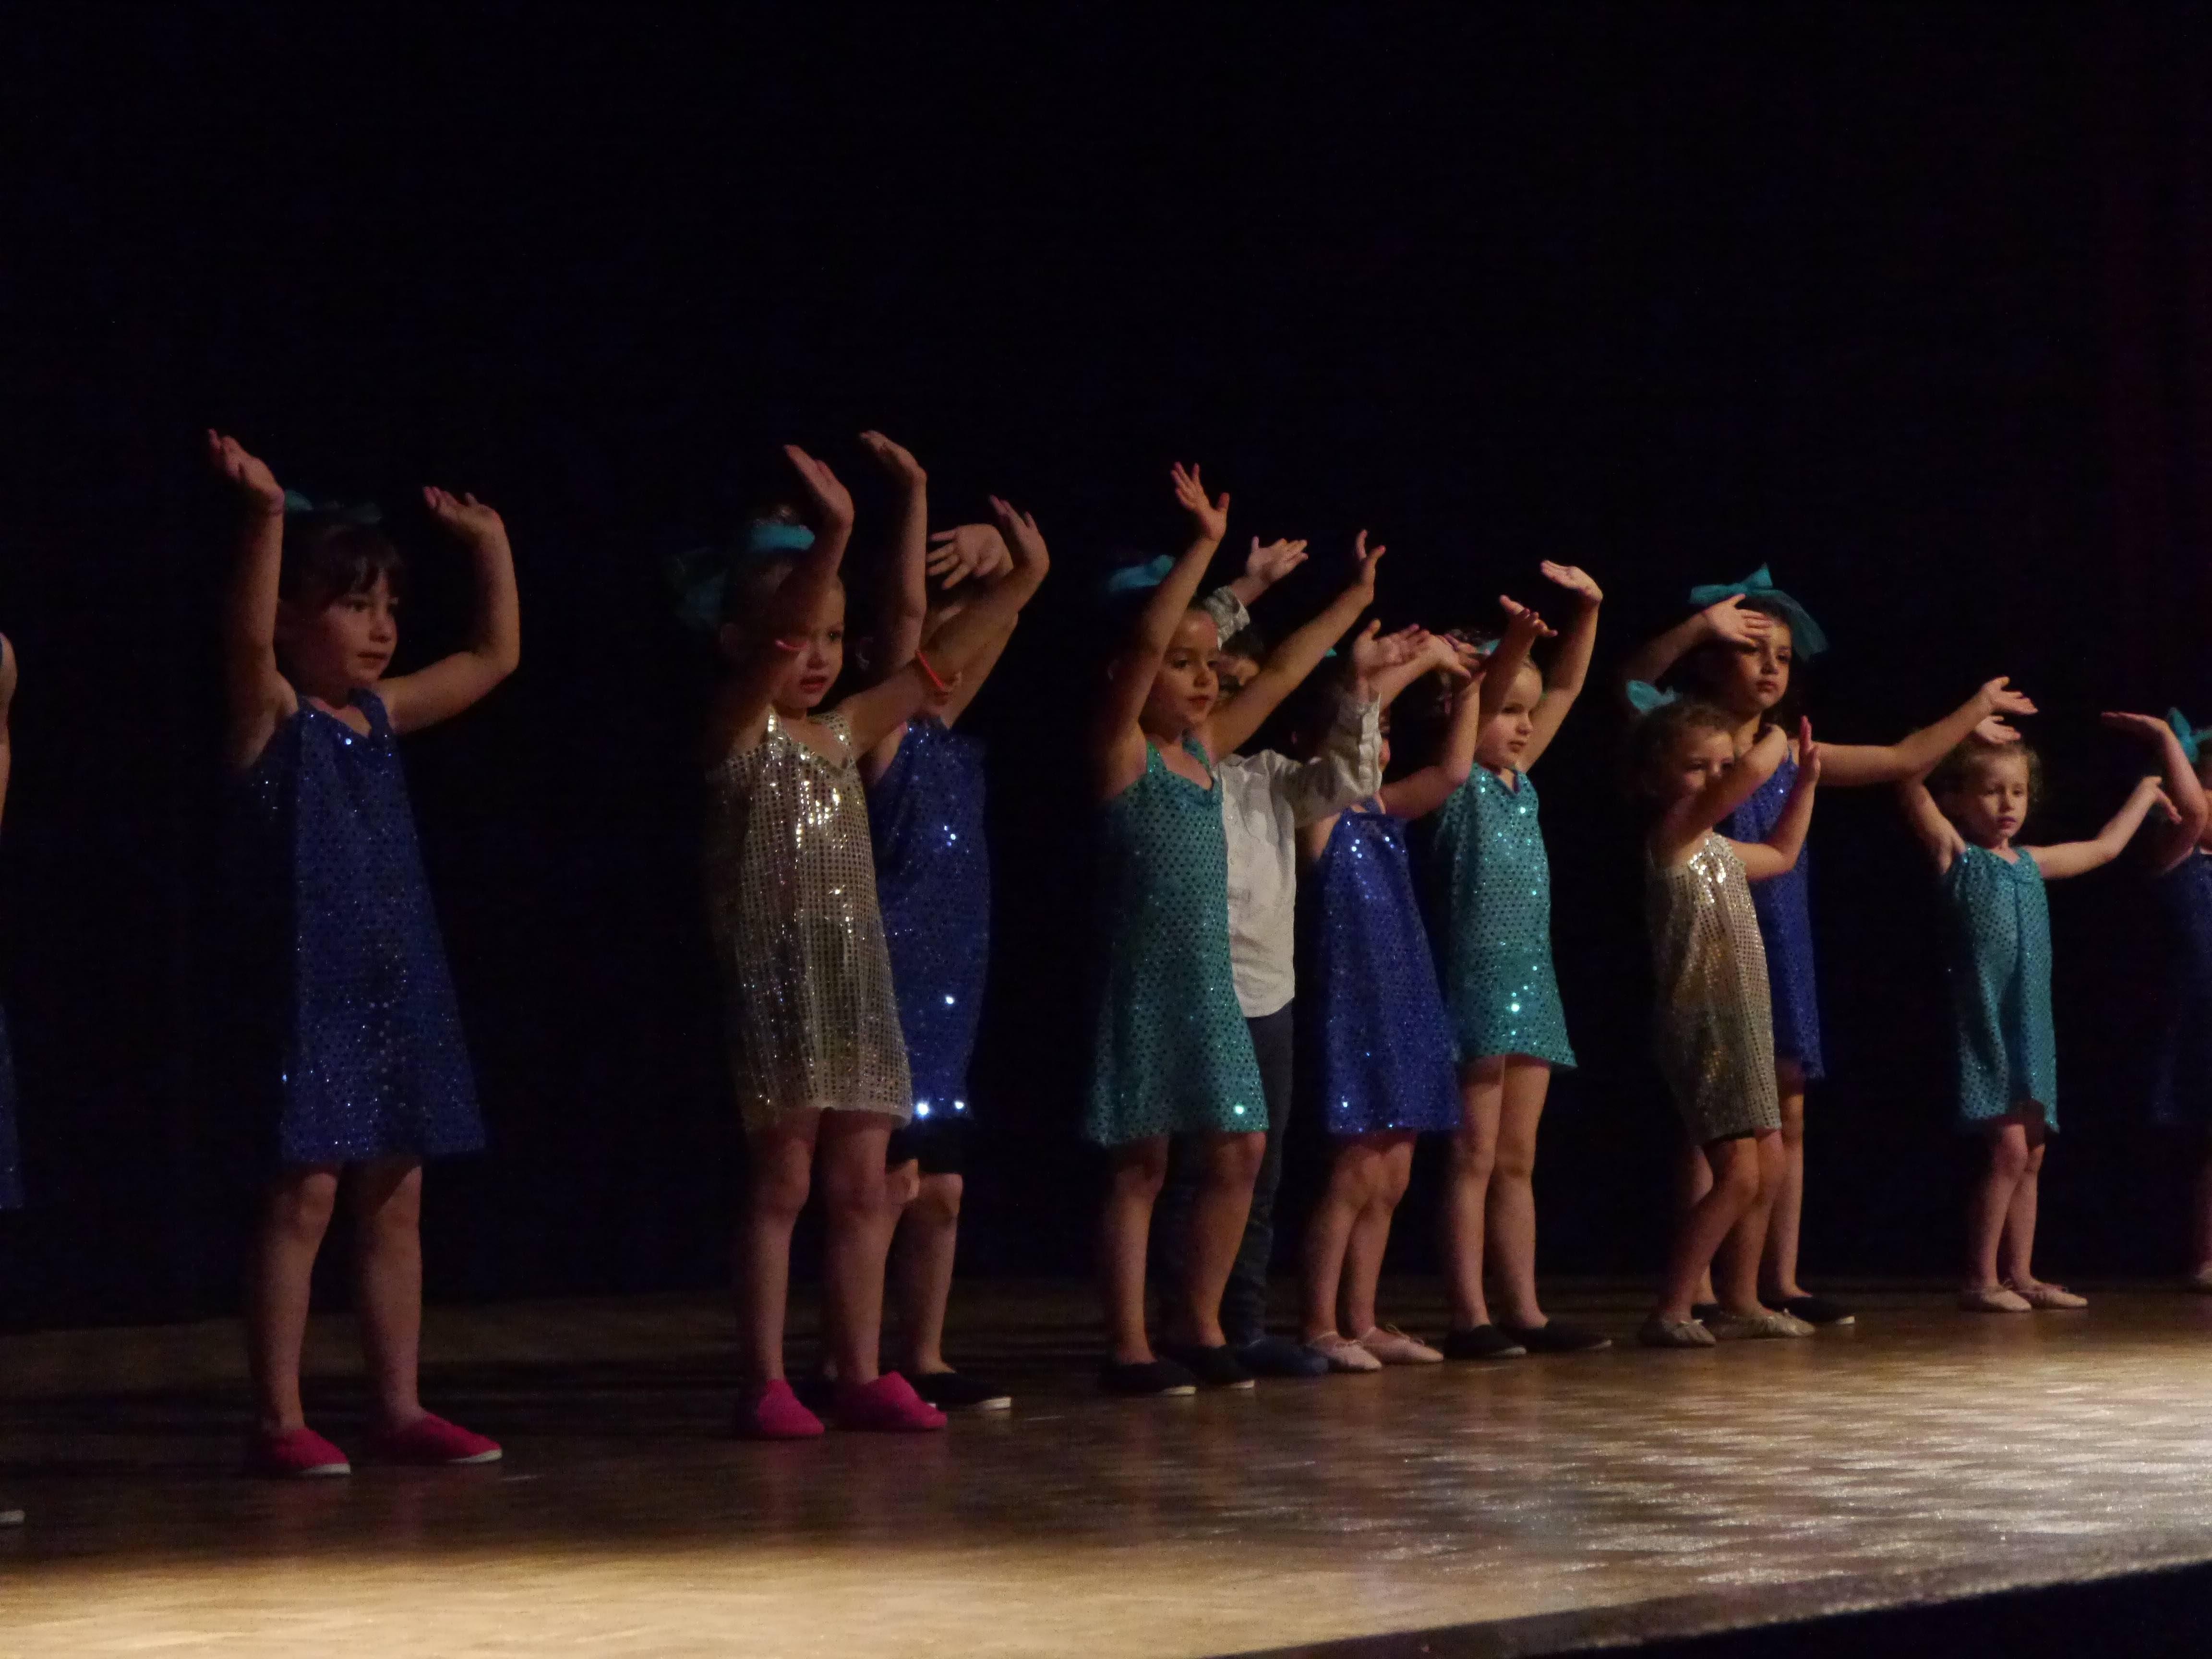 gala-danse-rythmique-fli-pompey 1 (7)